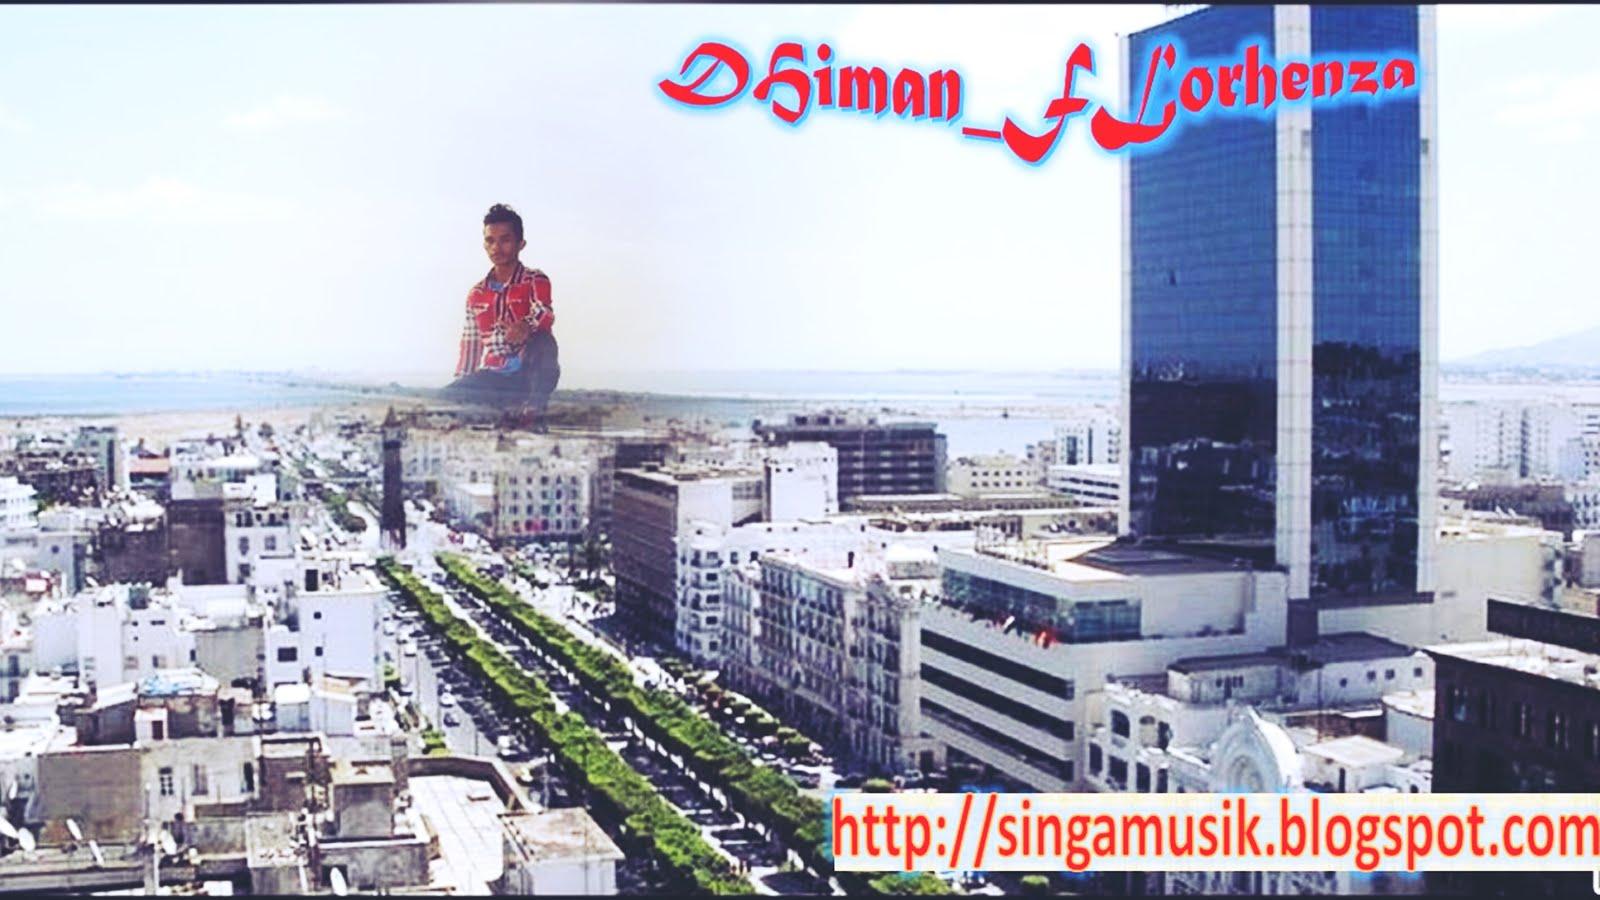 DHiman_FLorhenza